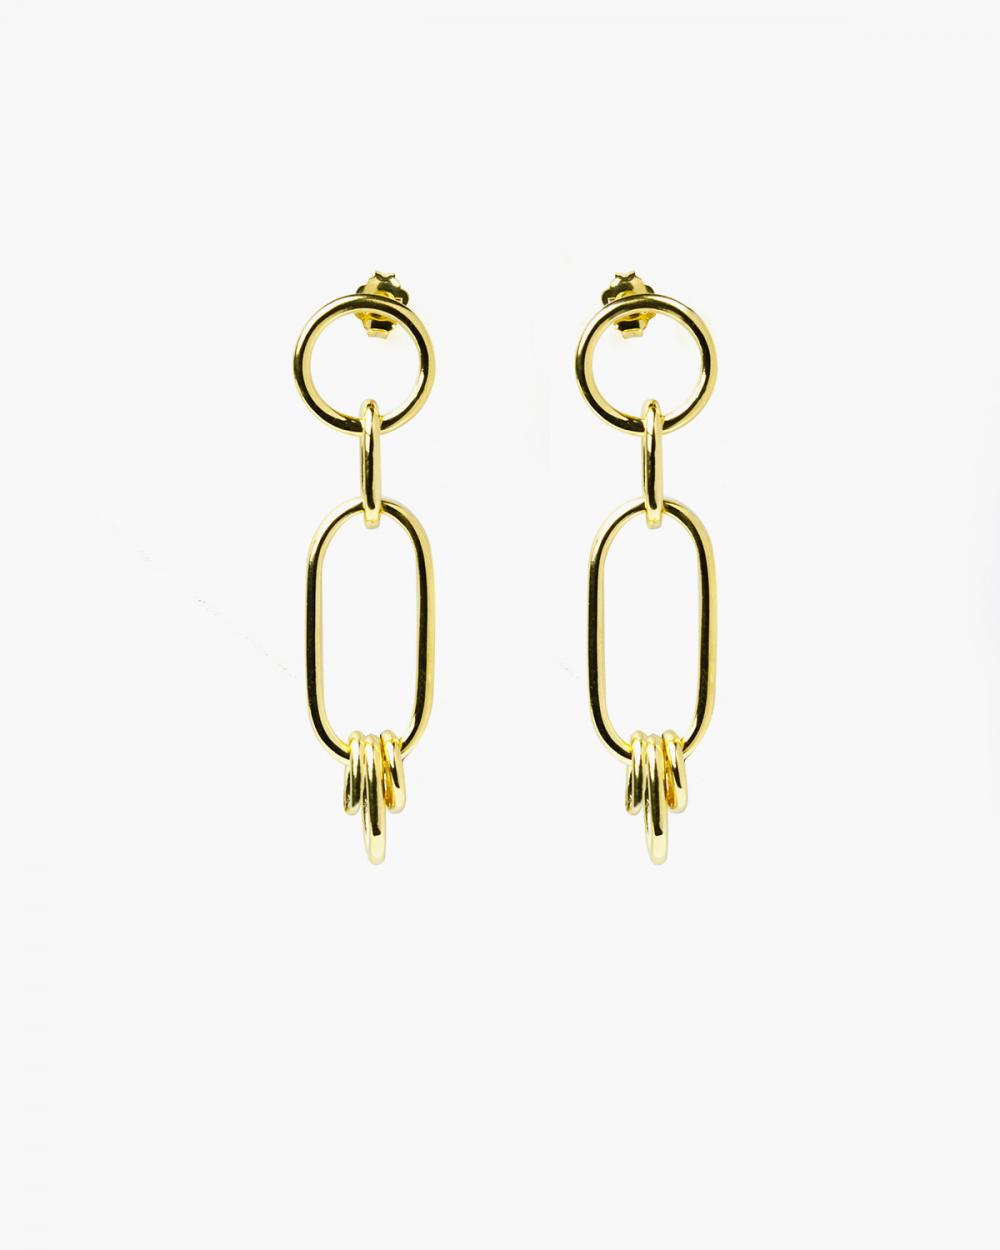 Earrings YELLOW GOLD LAMBDA EARRINGS NOVE25